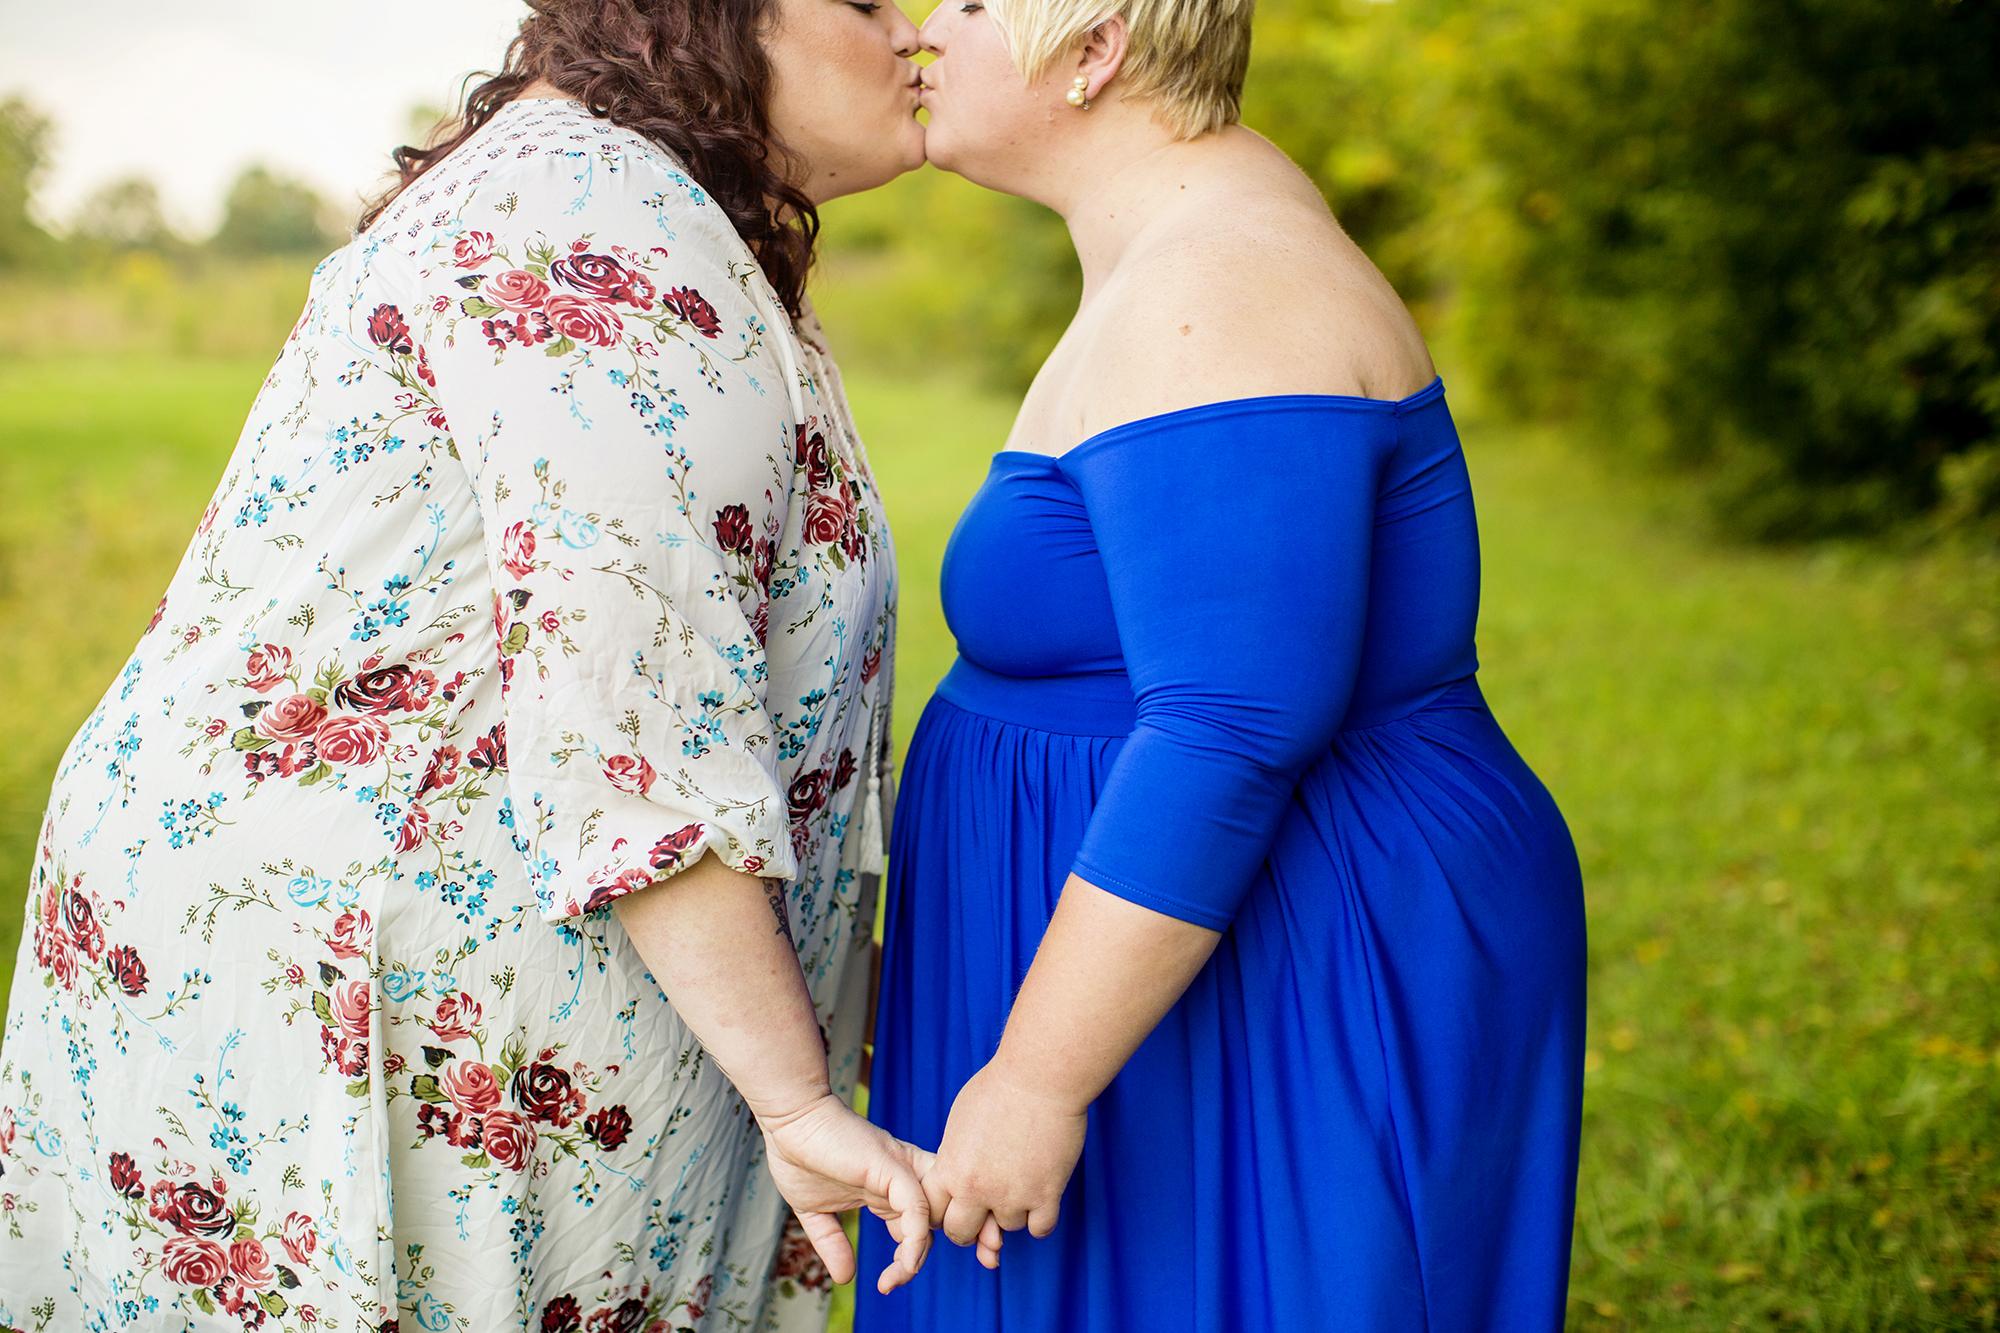 Seriously_Sabrina_Photography_Lexington_Kentucky_Maternity_Portraits_Hisle_Farm_JC10.jpg